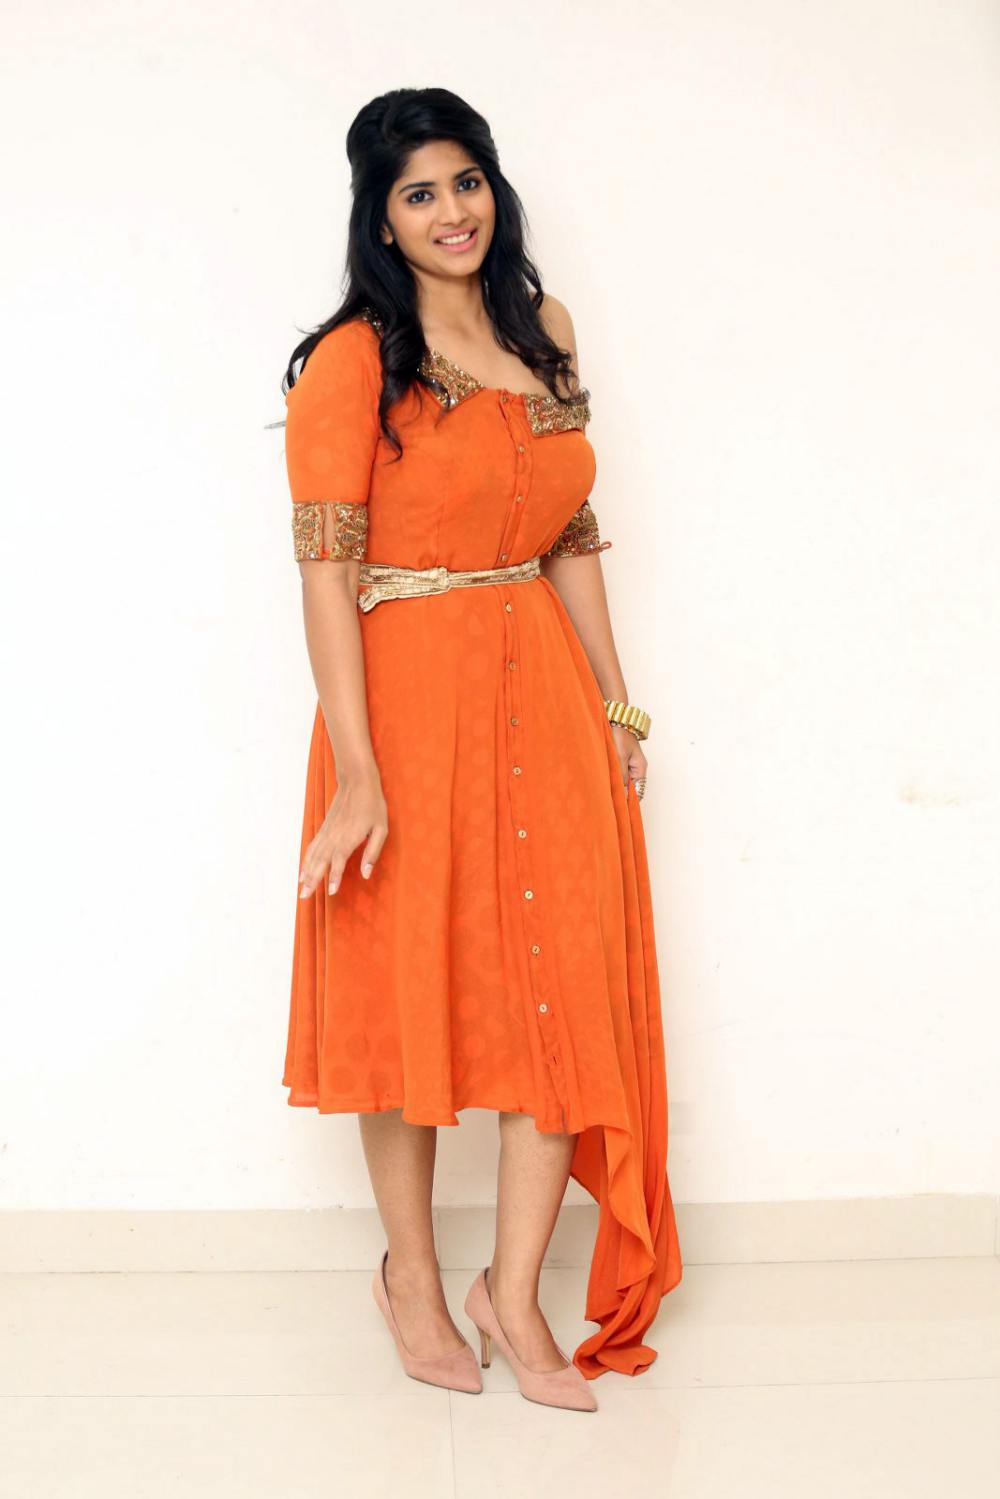 Megha Akash at peta movie audio launch (5)